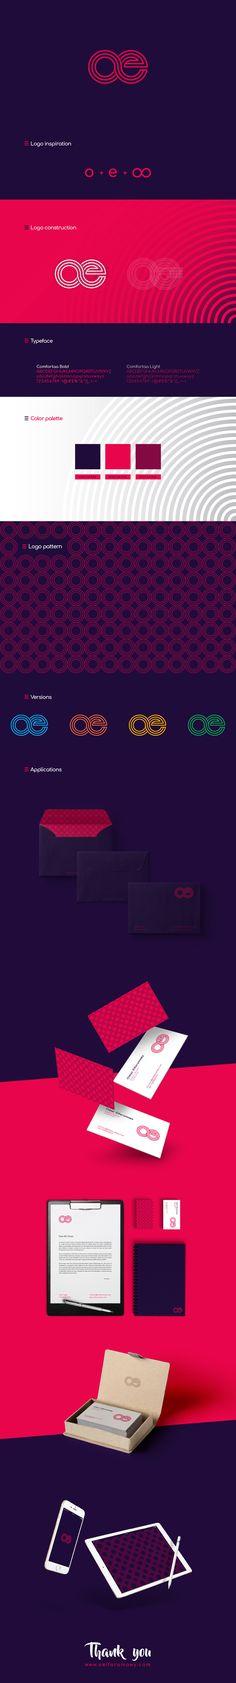 oelfaramawy - Personal logo and branding identity